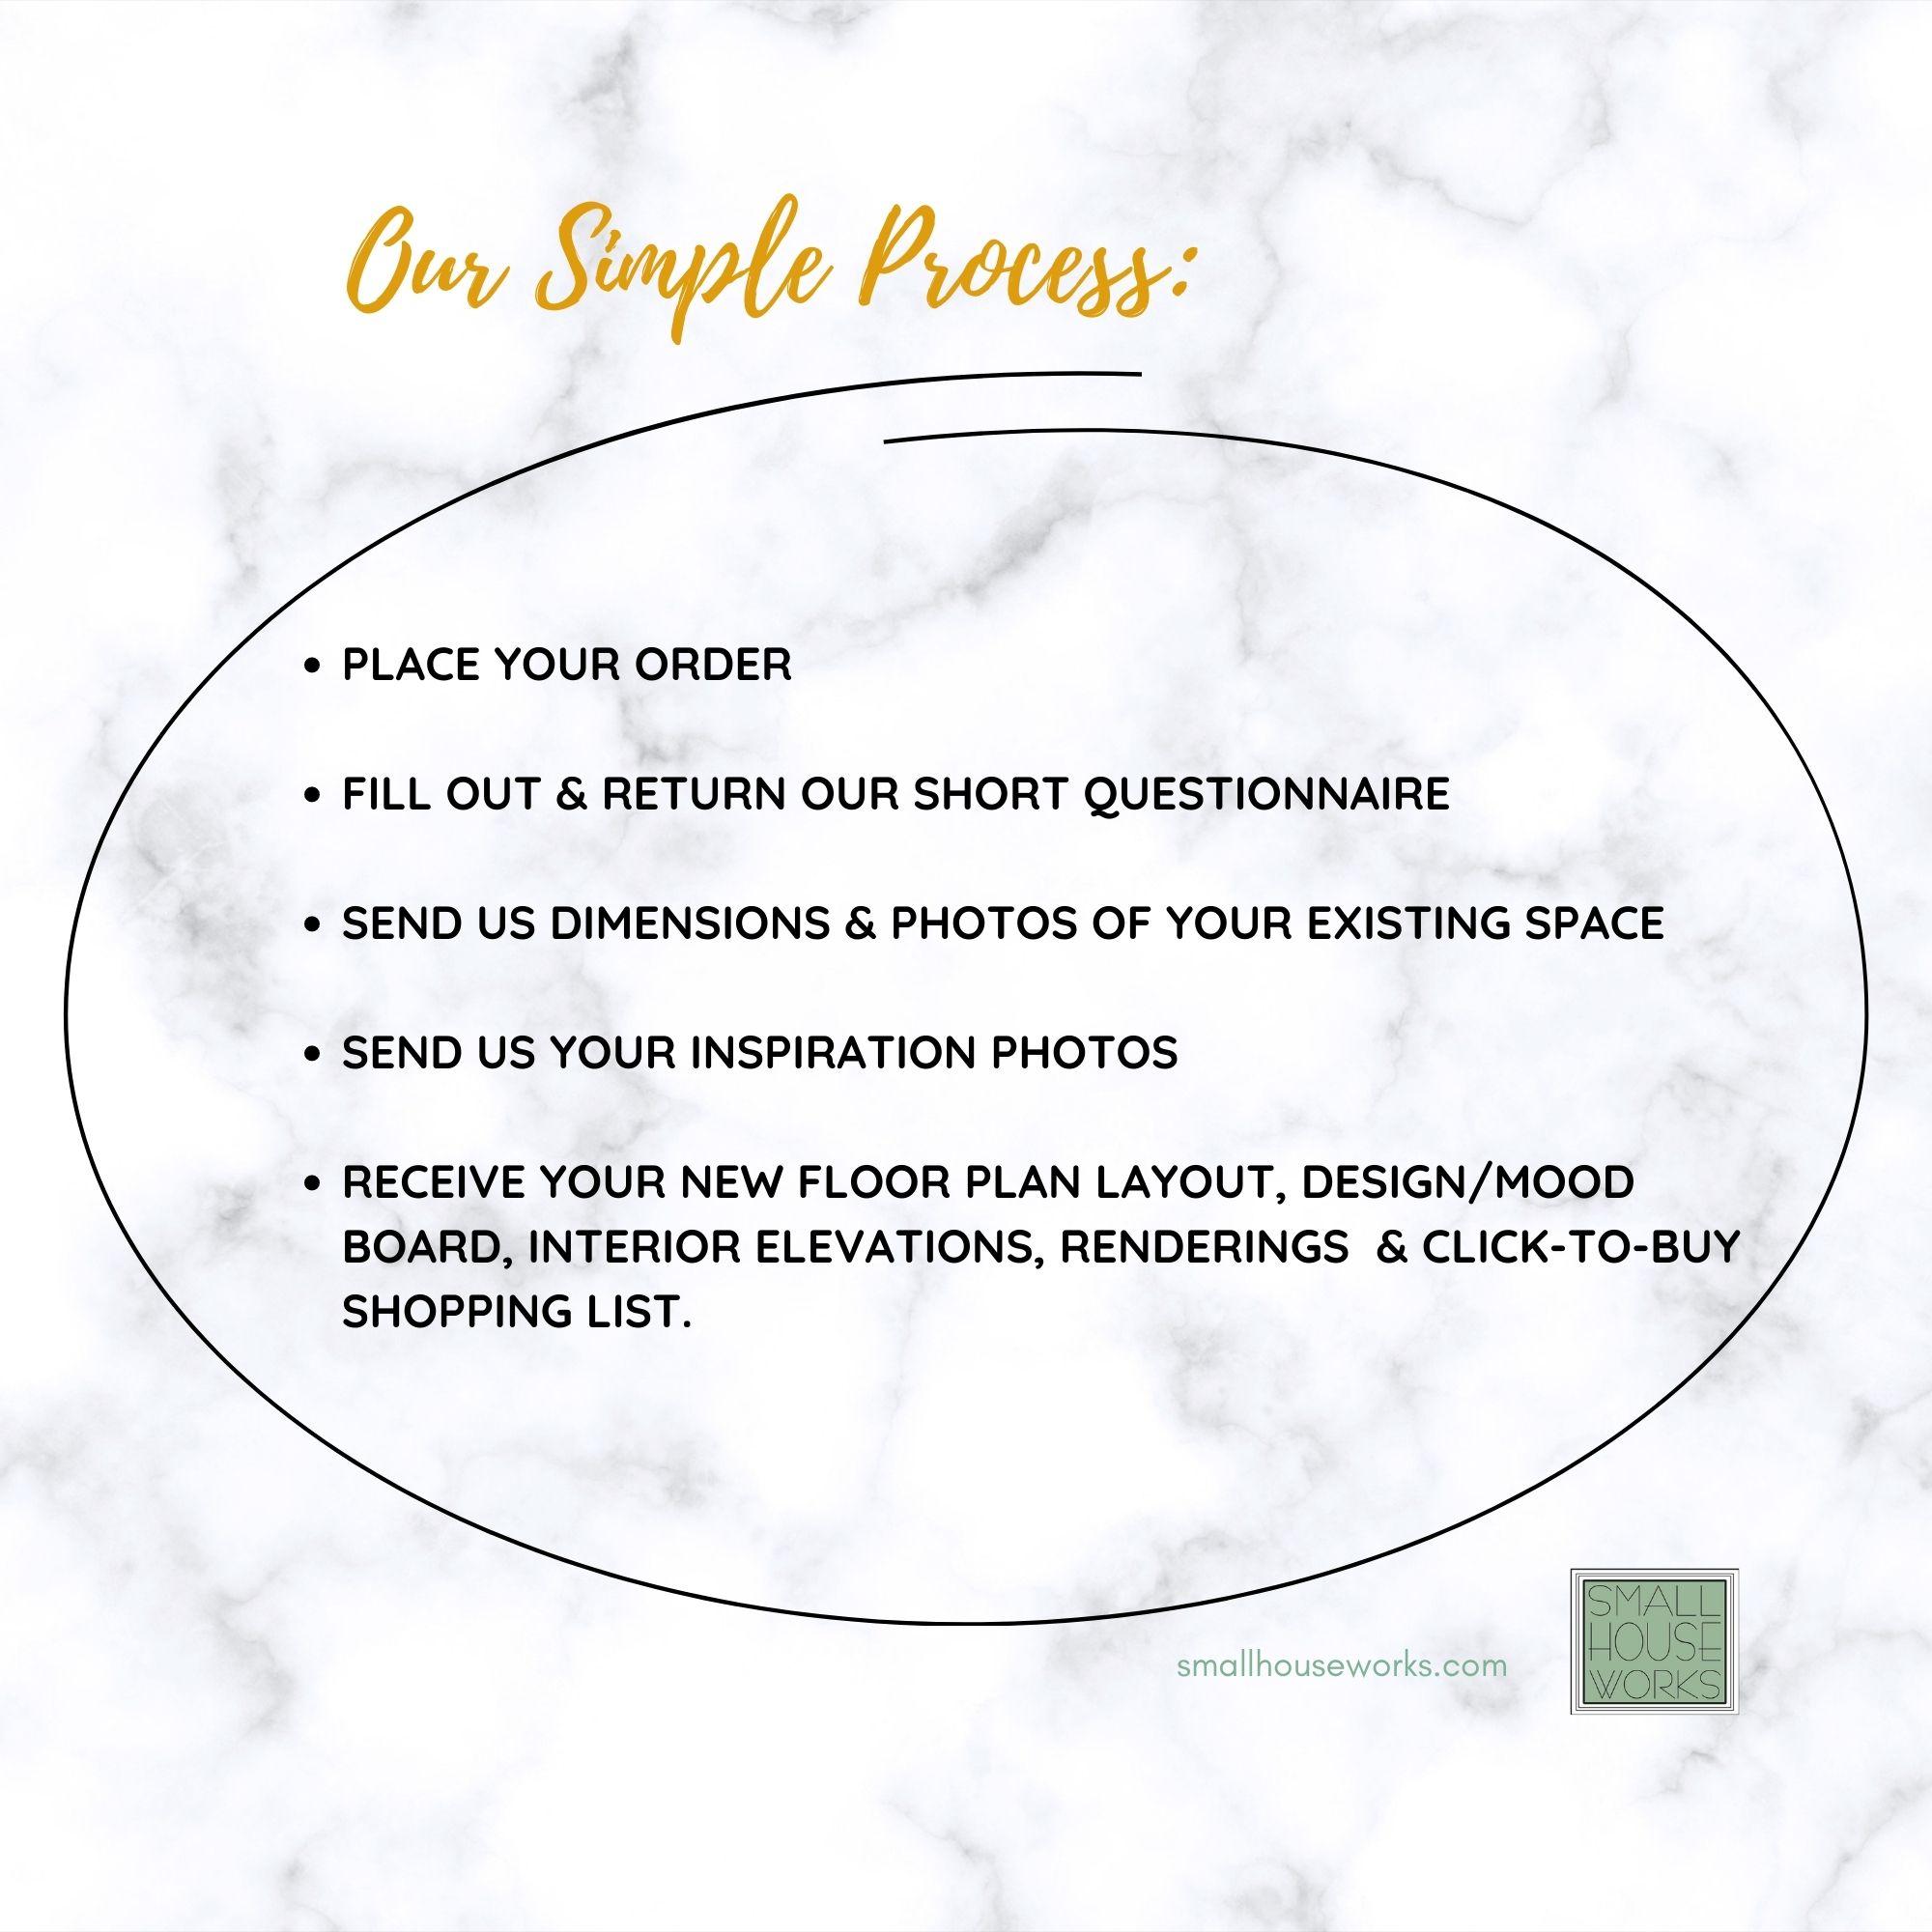 OUR SIMPLE PROCESS- ALL E DESIGN SERVICES